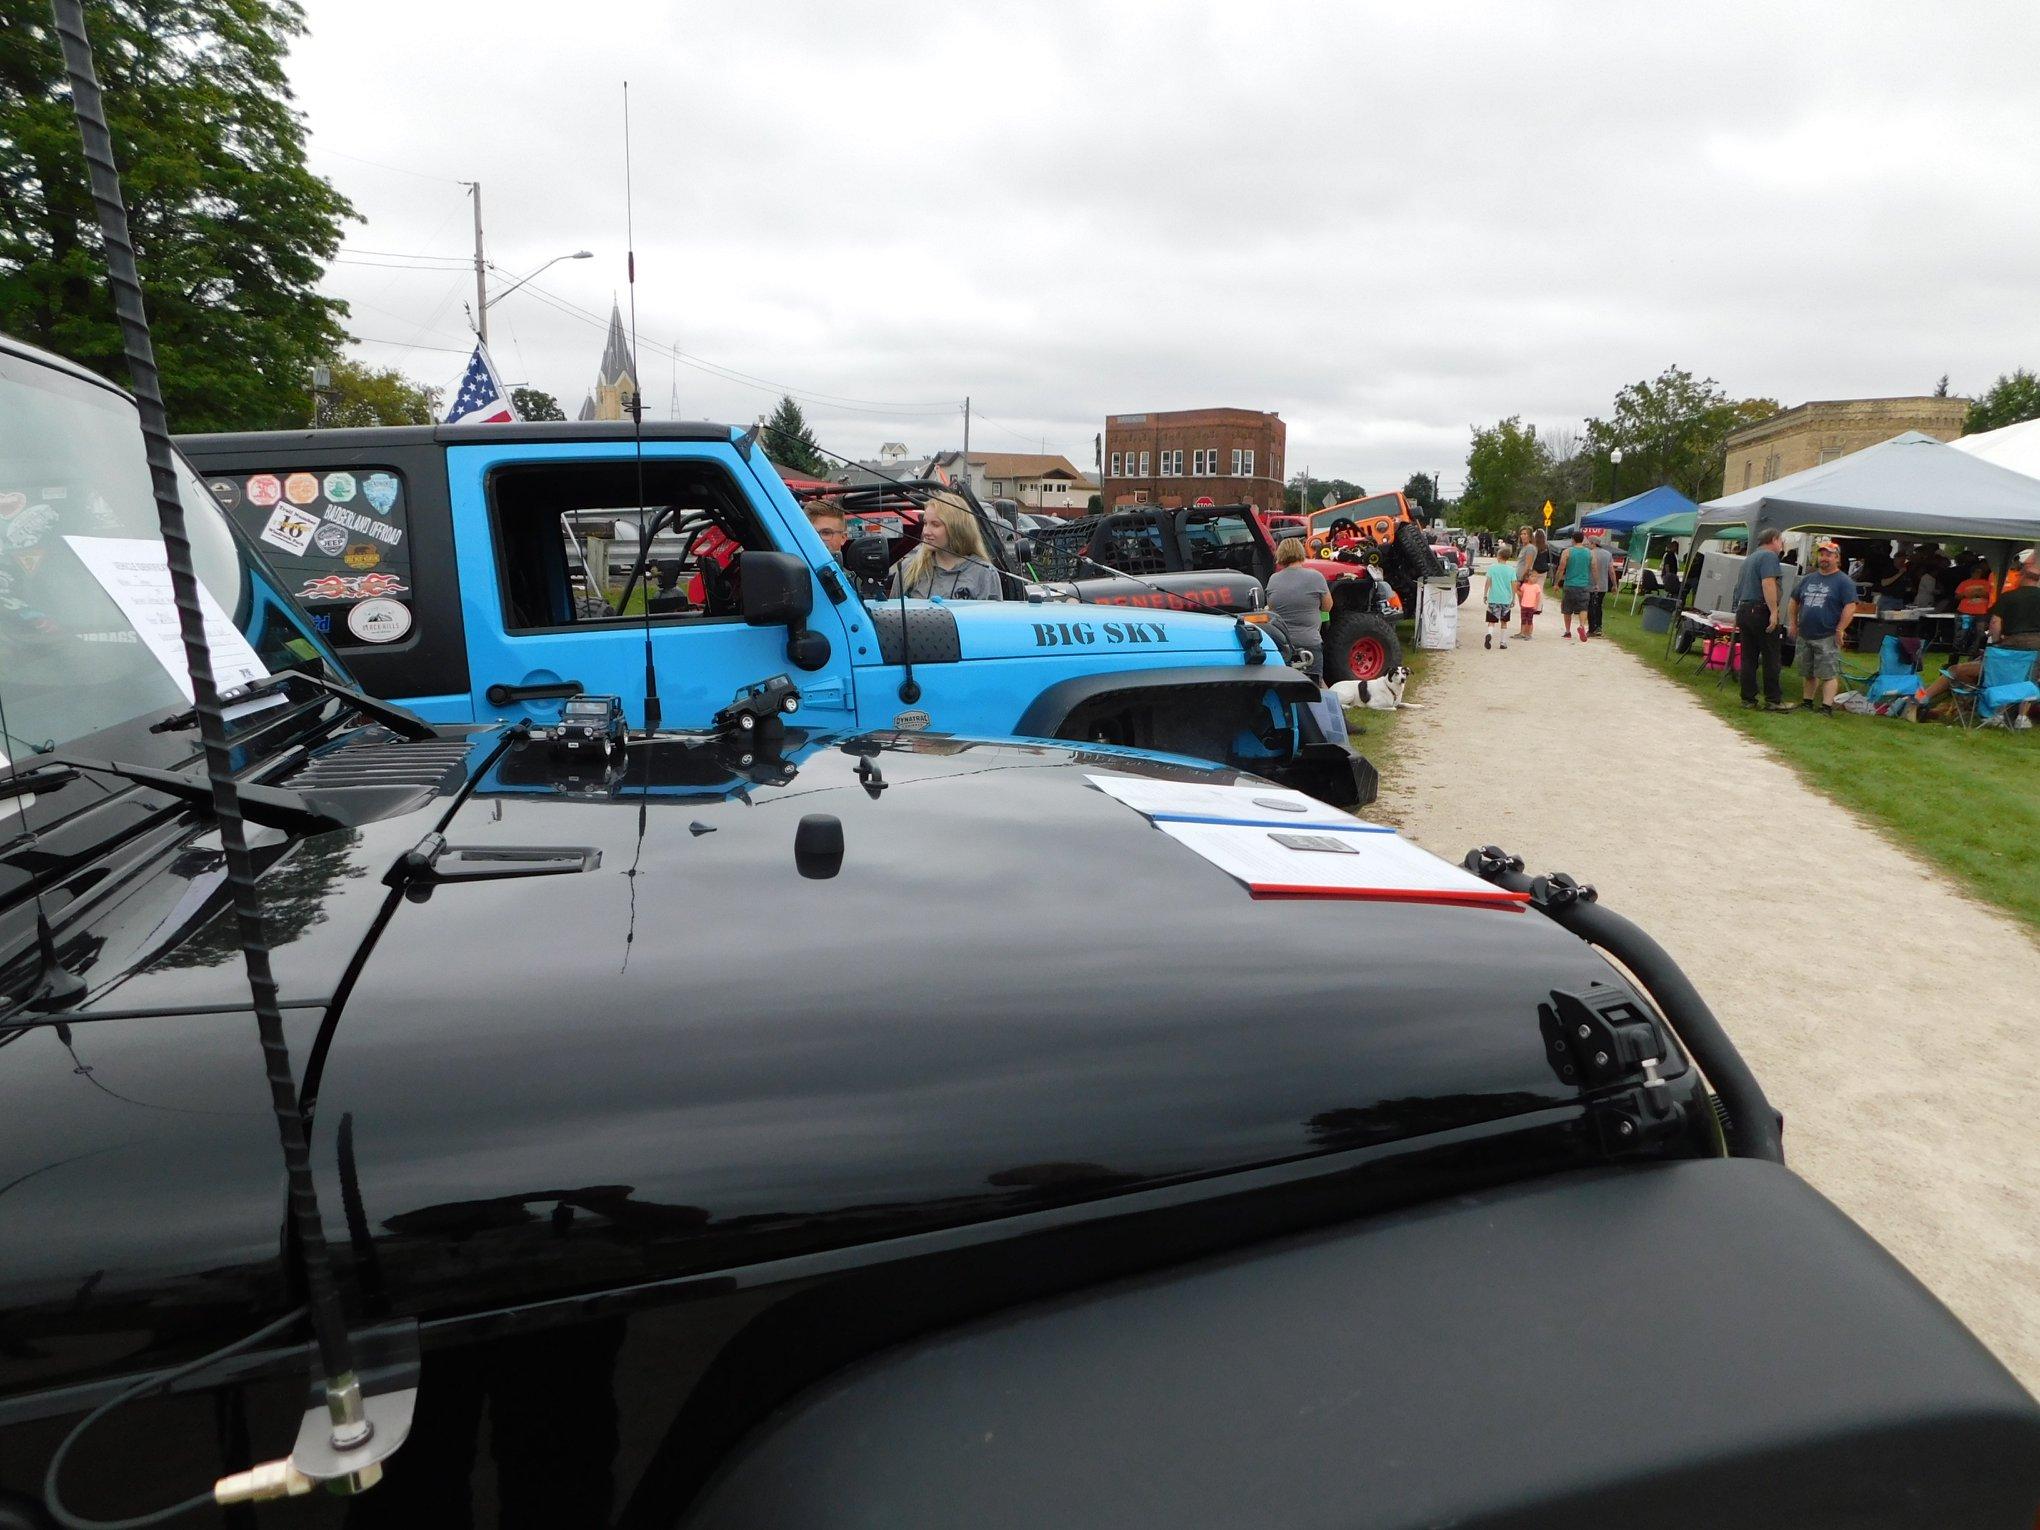 2019 Kewaskum Car Show